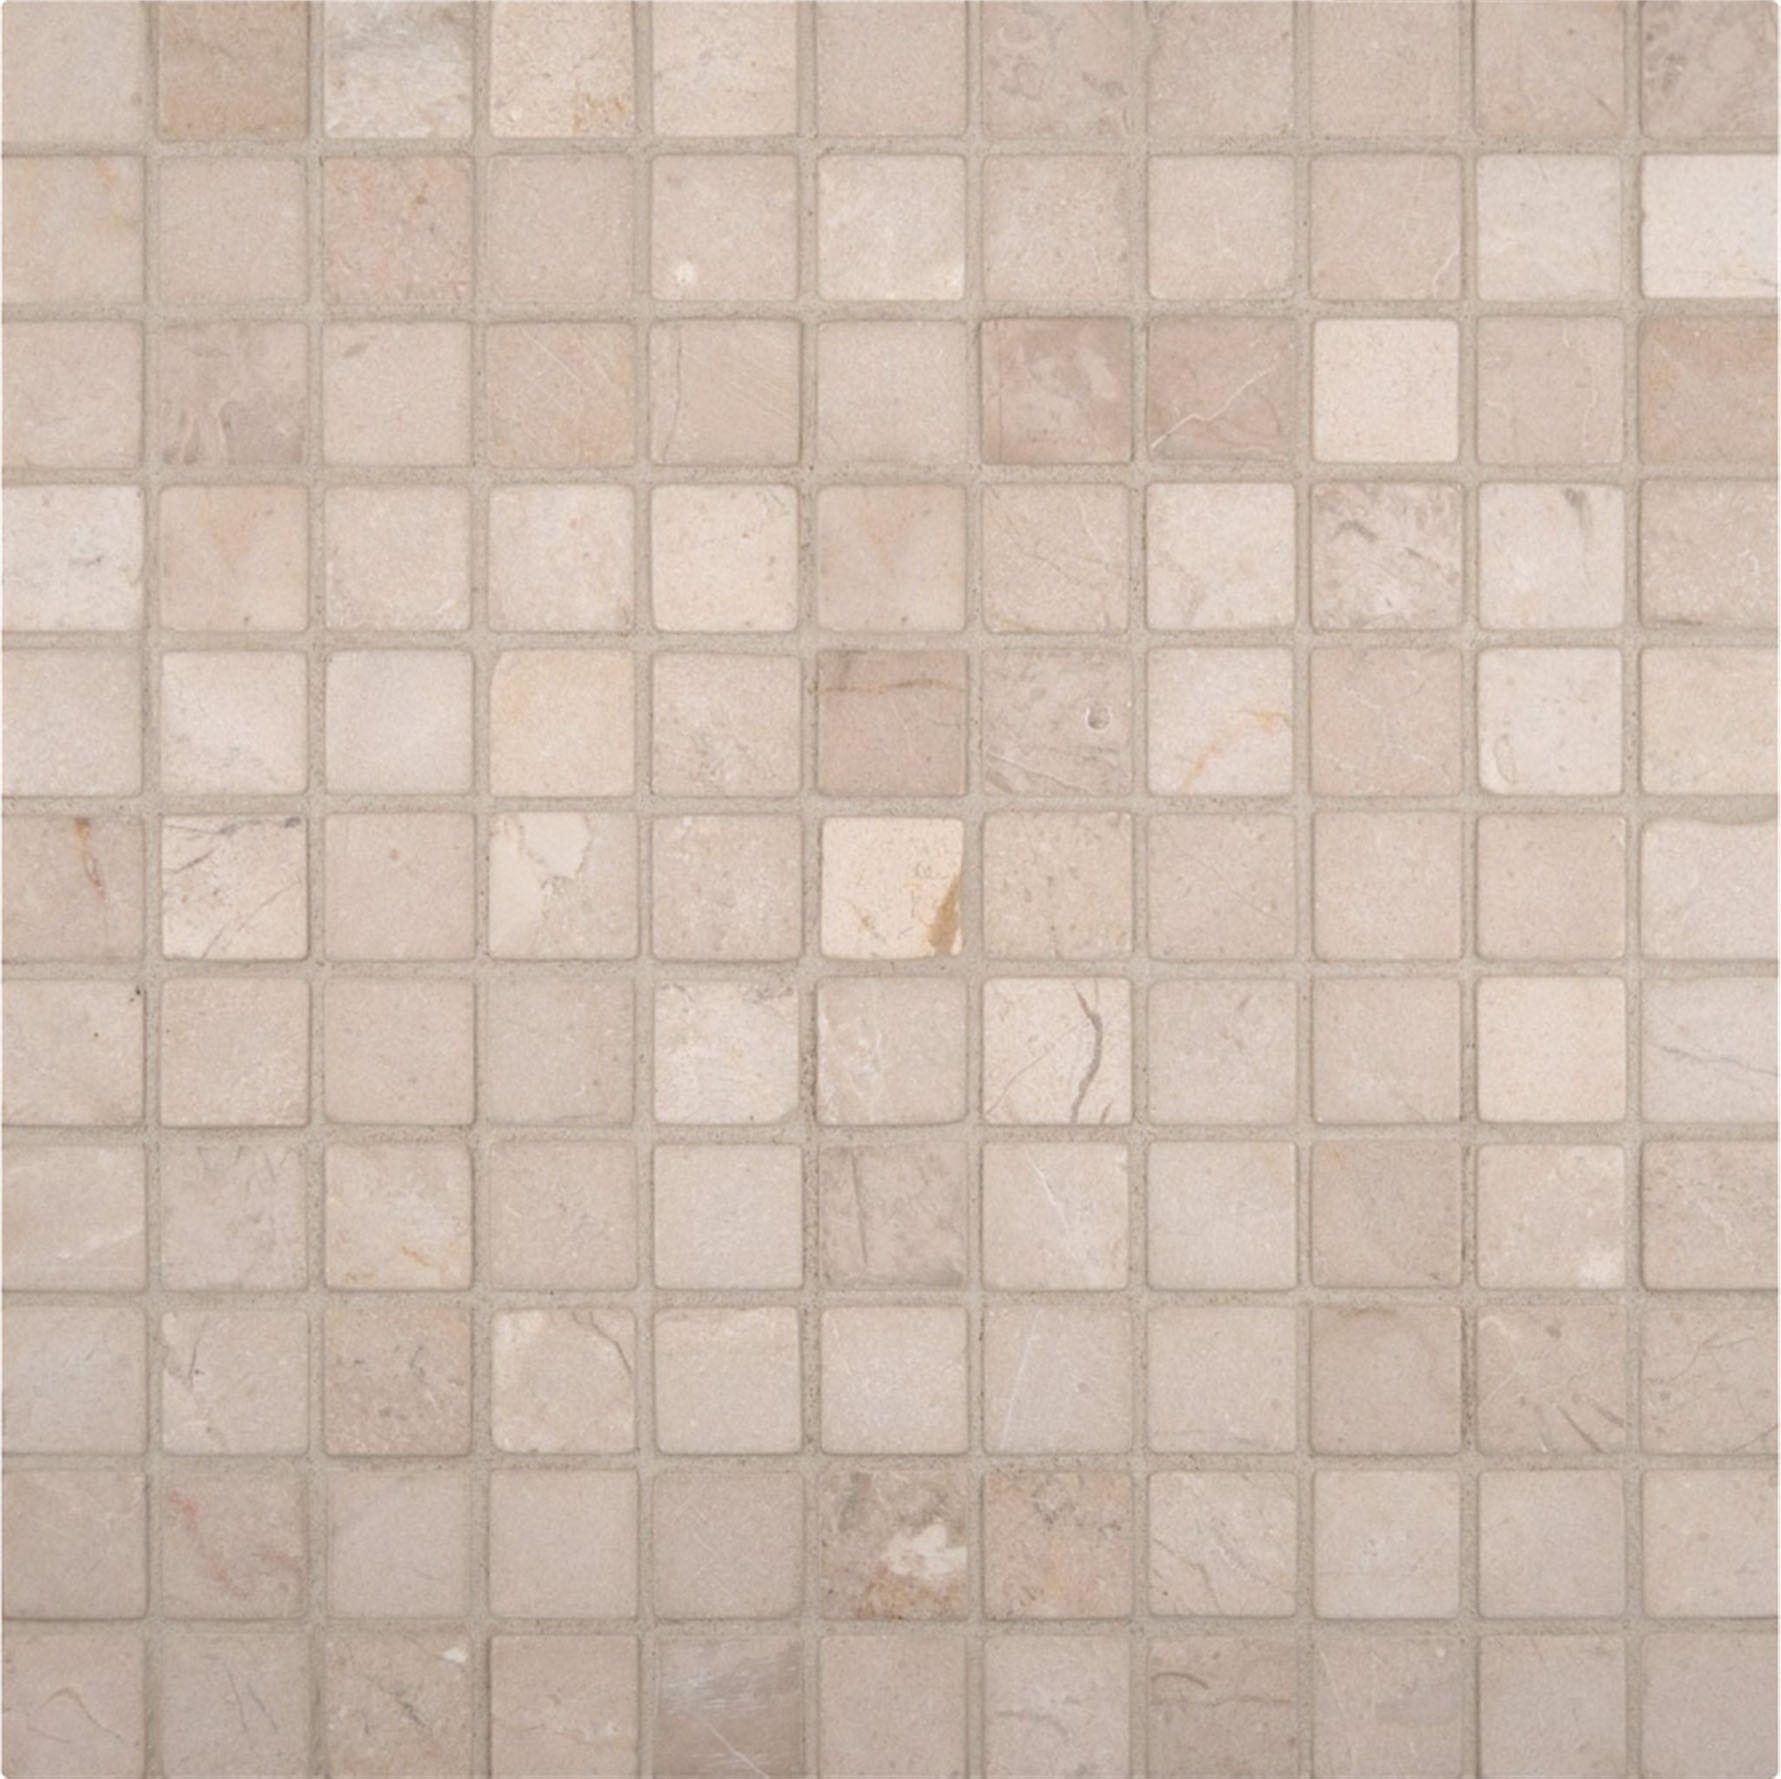 12x12 Crema Marfil 1x1 Tumbled Marble Mosaic Mosaic Tiles Marble Mosaic Crema Marfil Marble Tiles